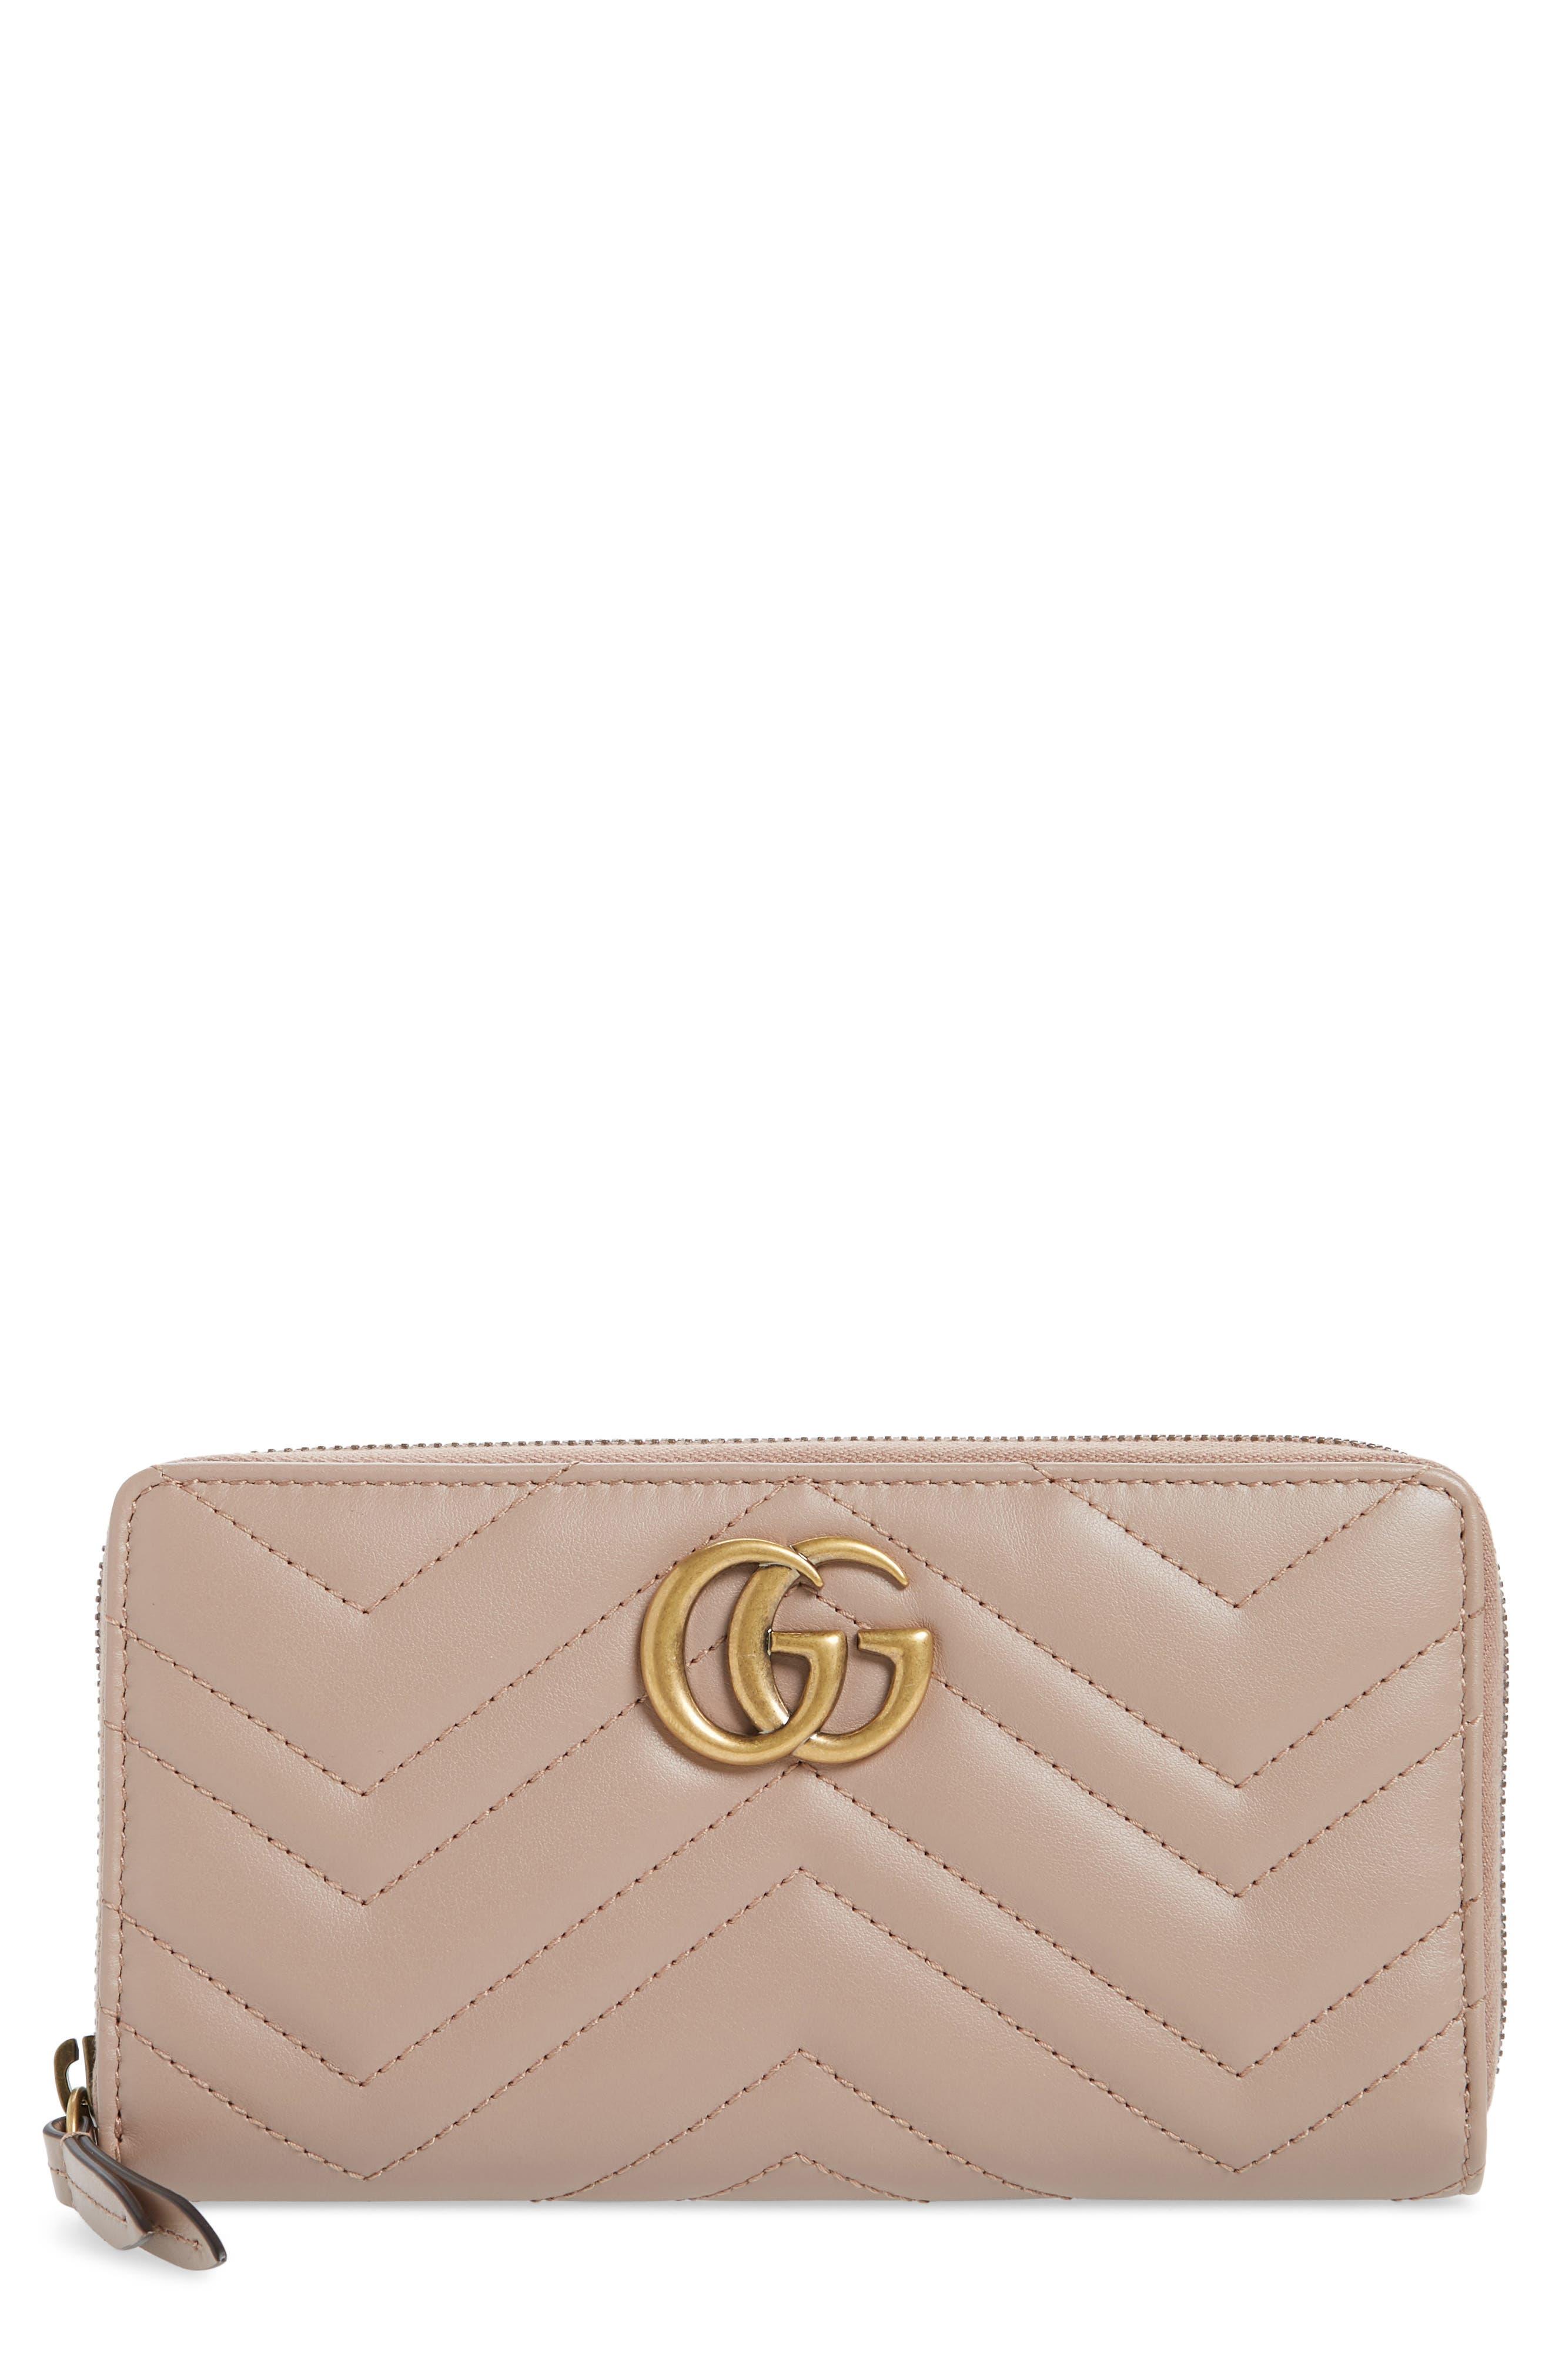 Gucci GG 2.0 Matelassé Leather Zip Around Wallet   Nordstrom